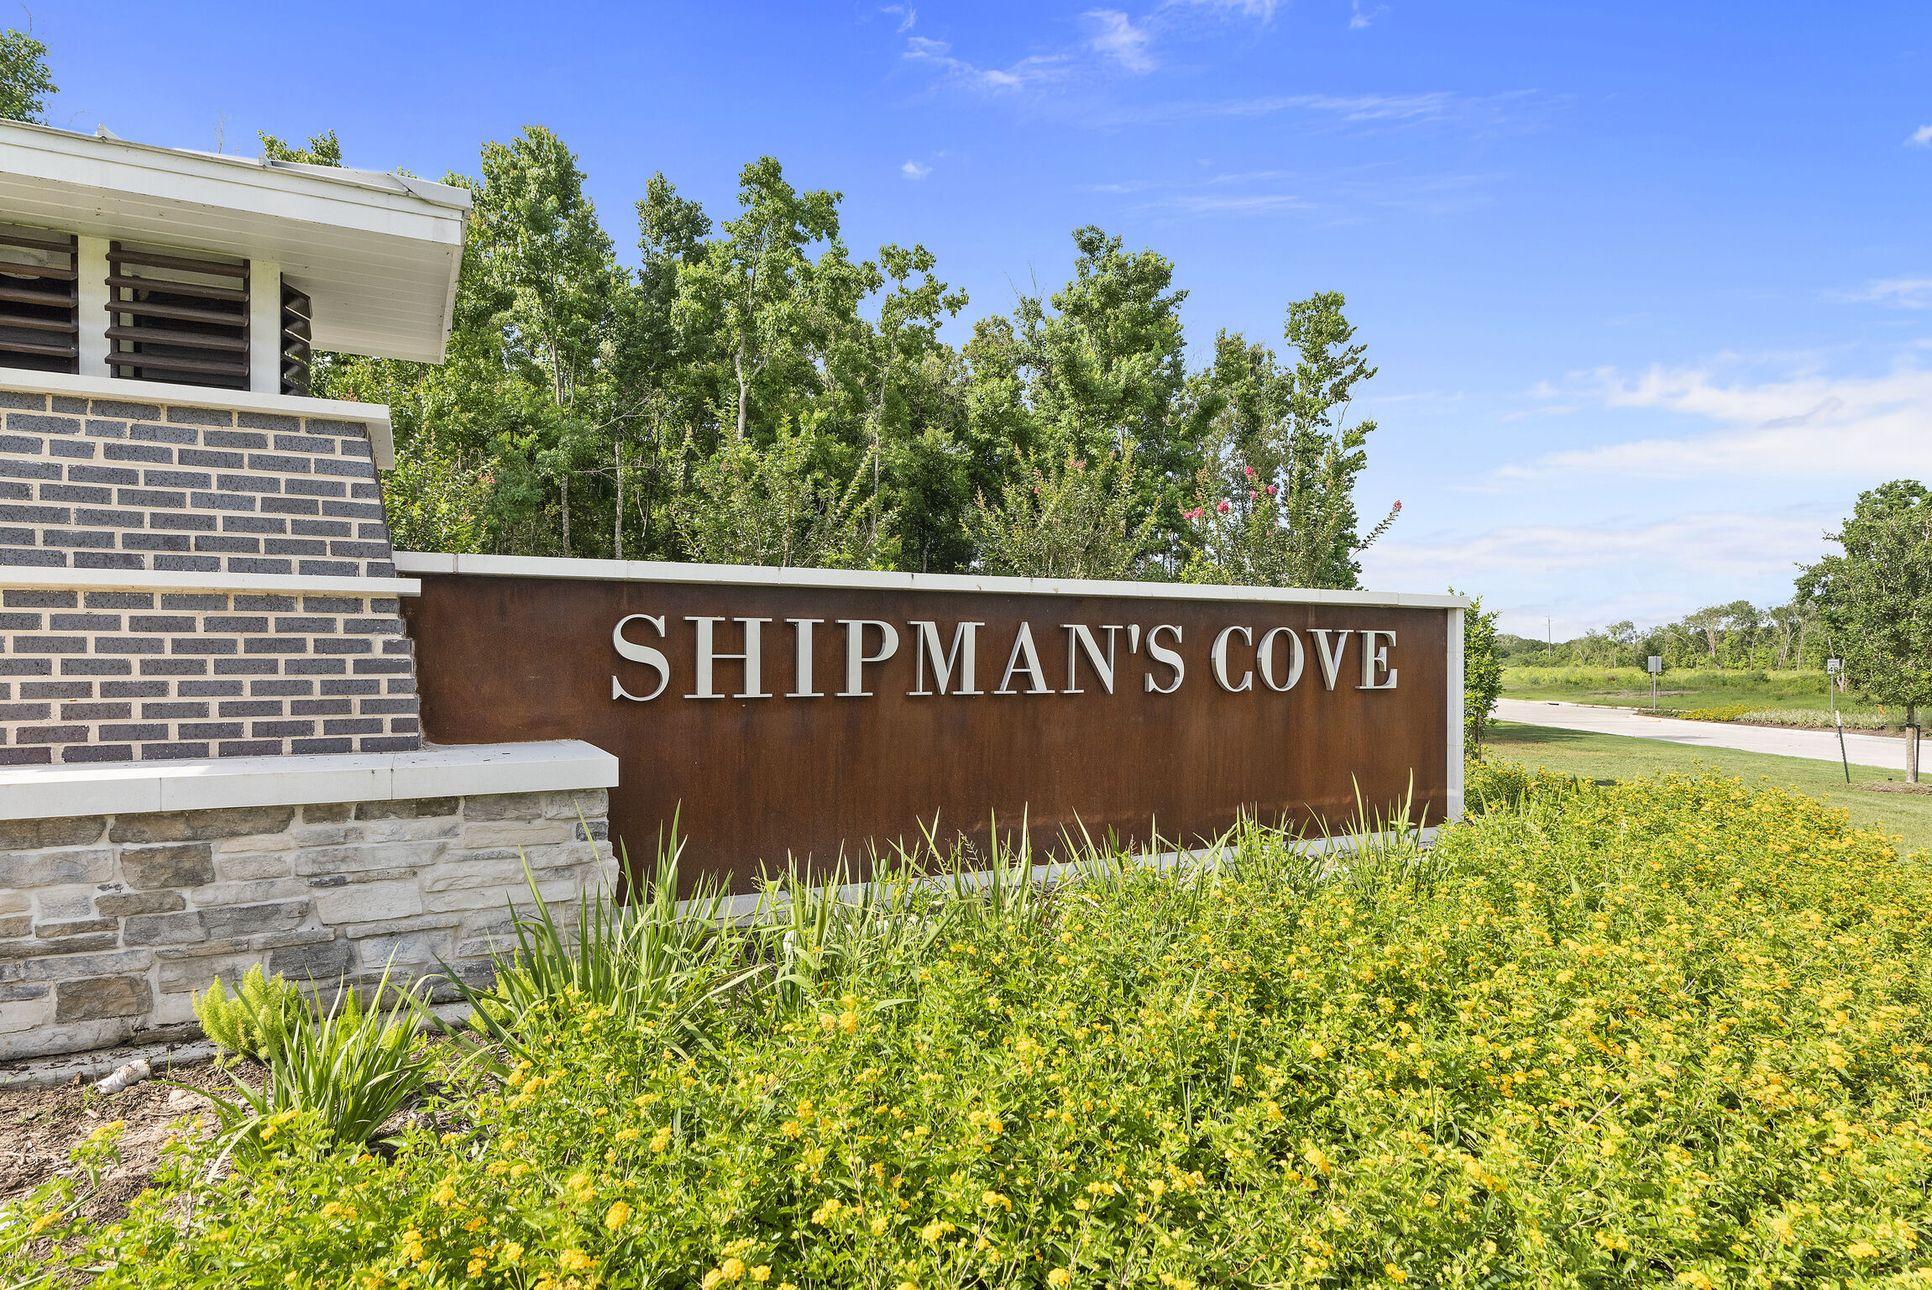 Shipman's Cove Entrance